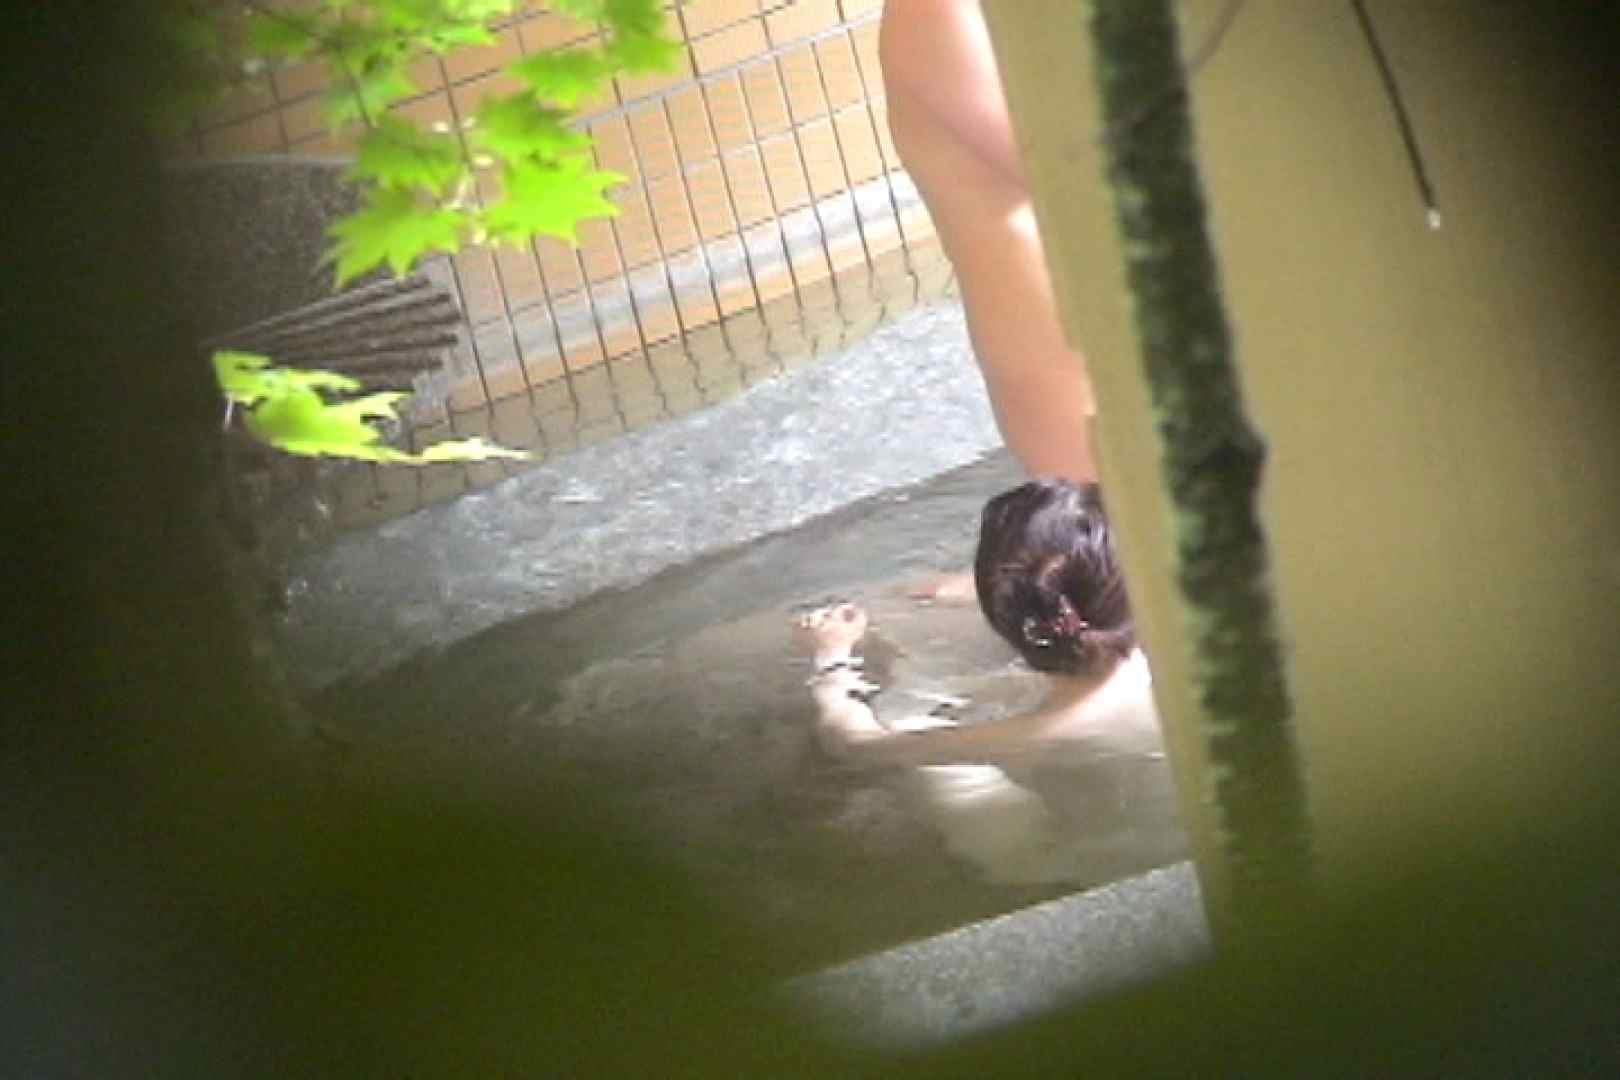 Aquaな露天風呂Vol.703 盗撮師作品  93pic 3